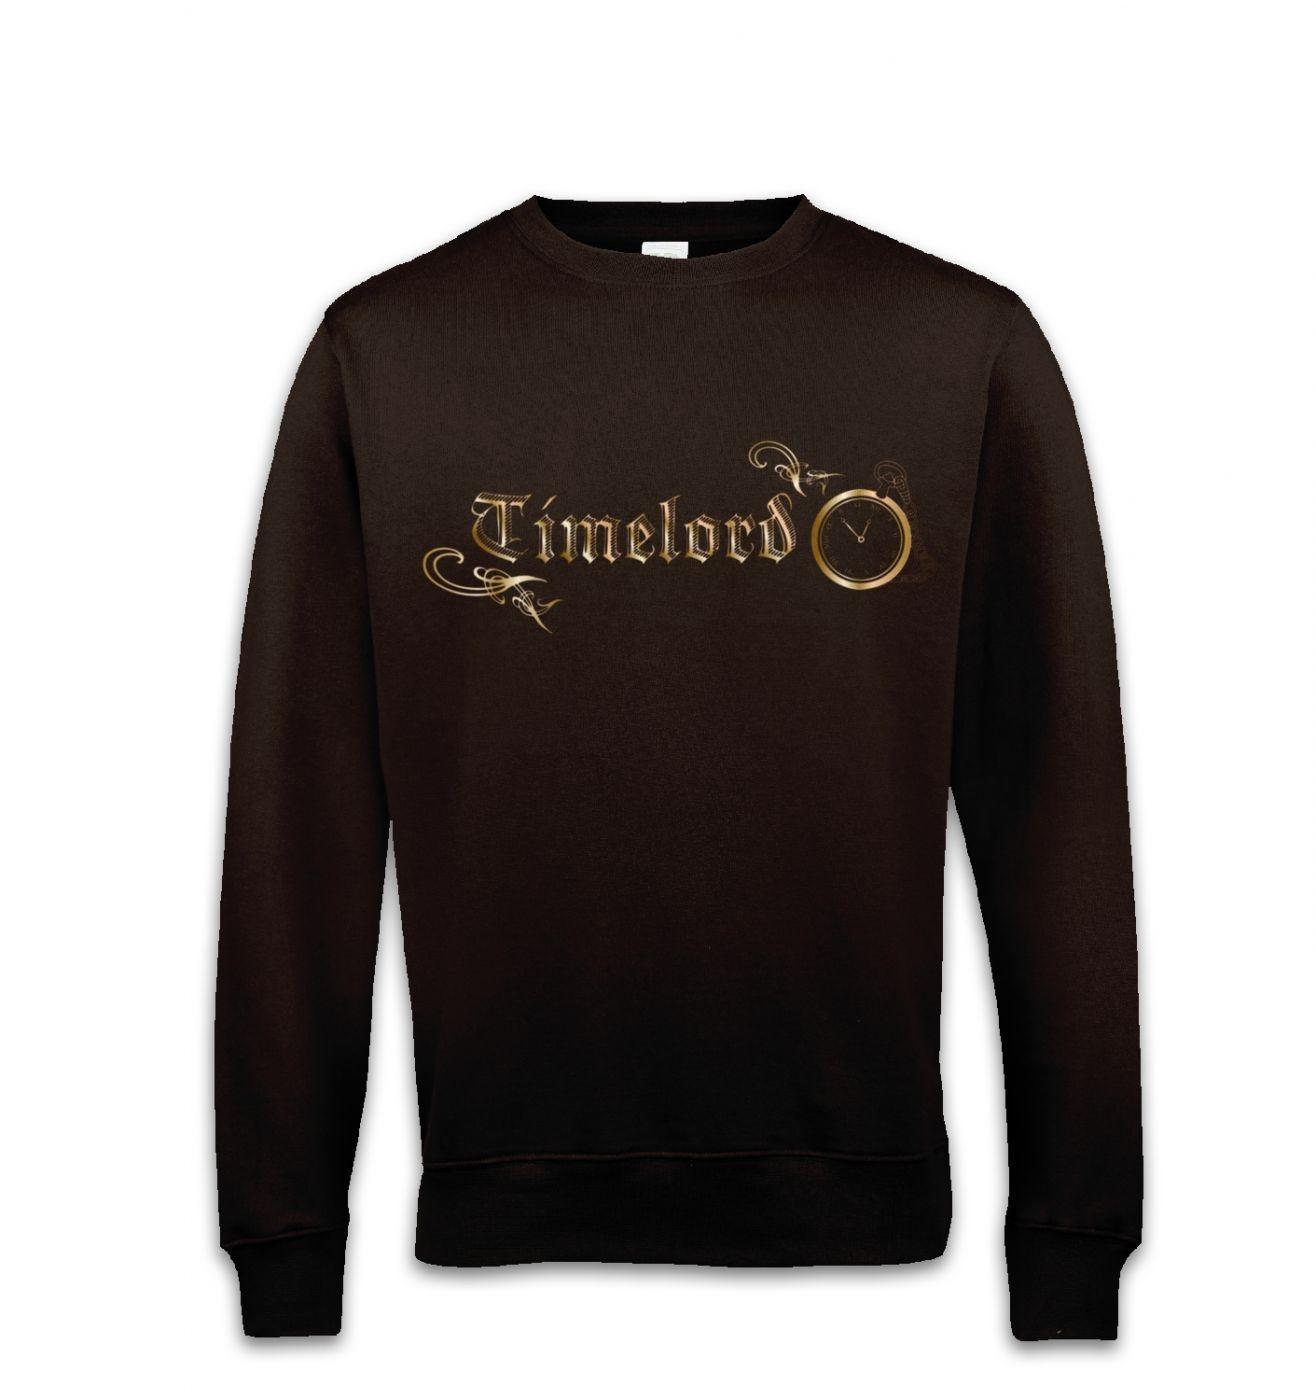 Timelord Ornate sweatshirt